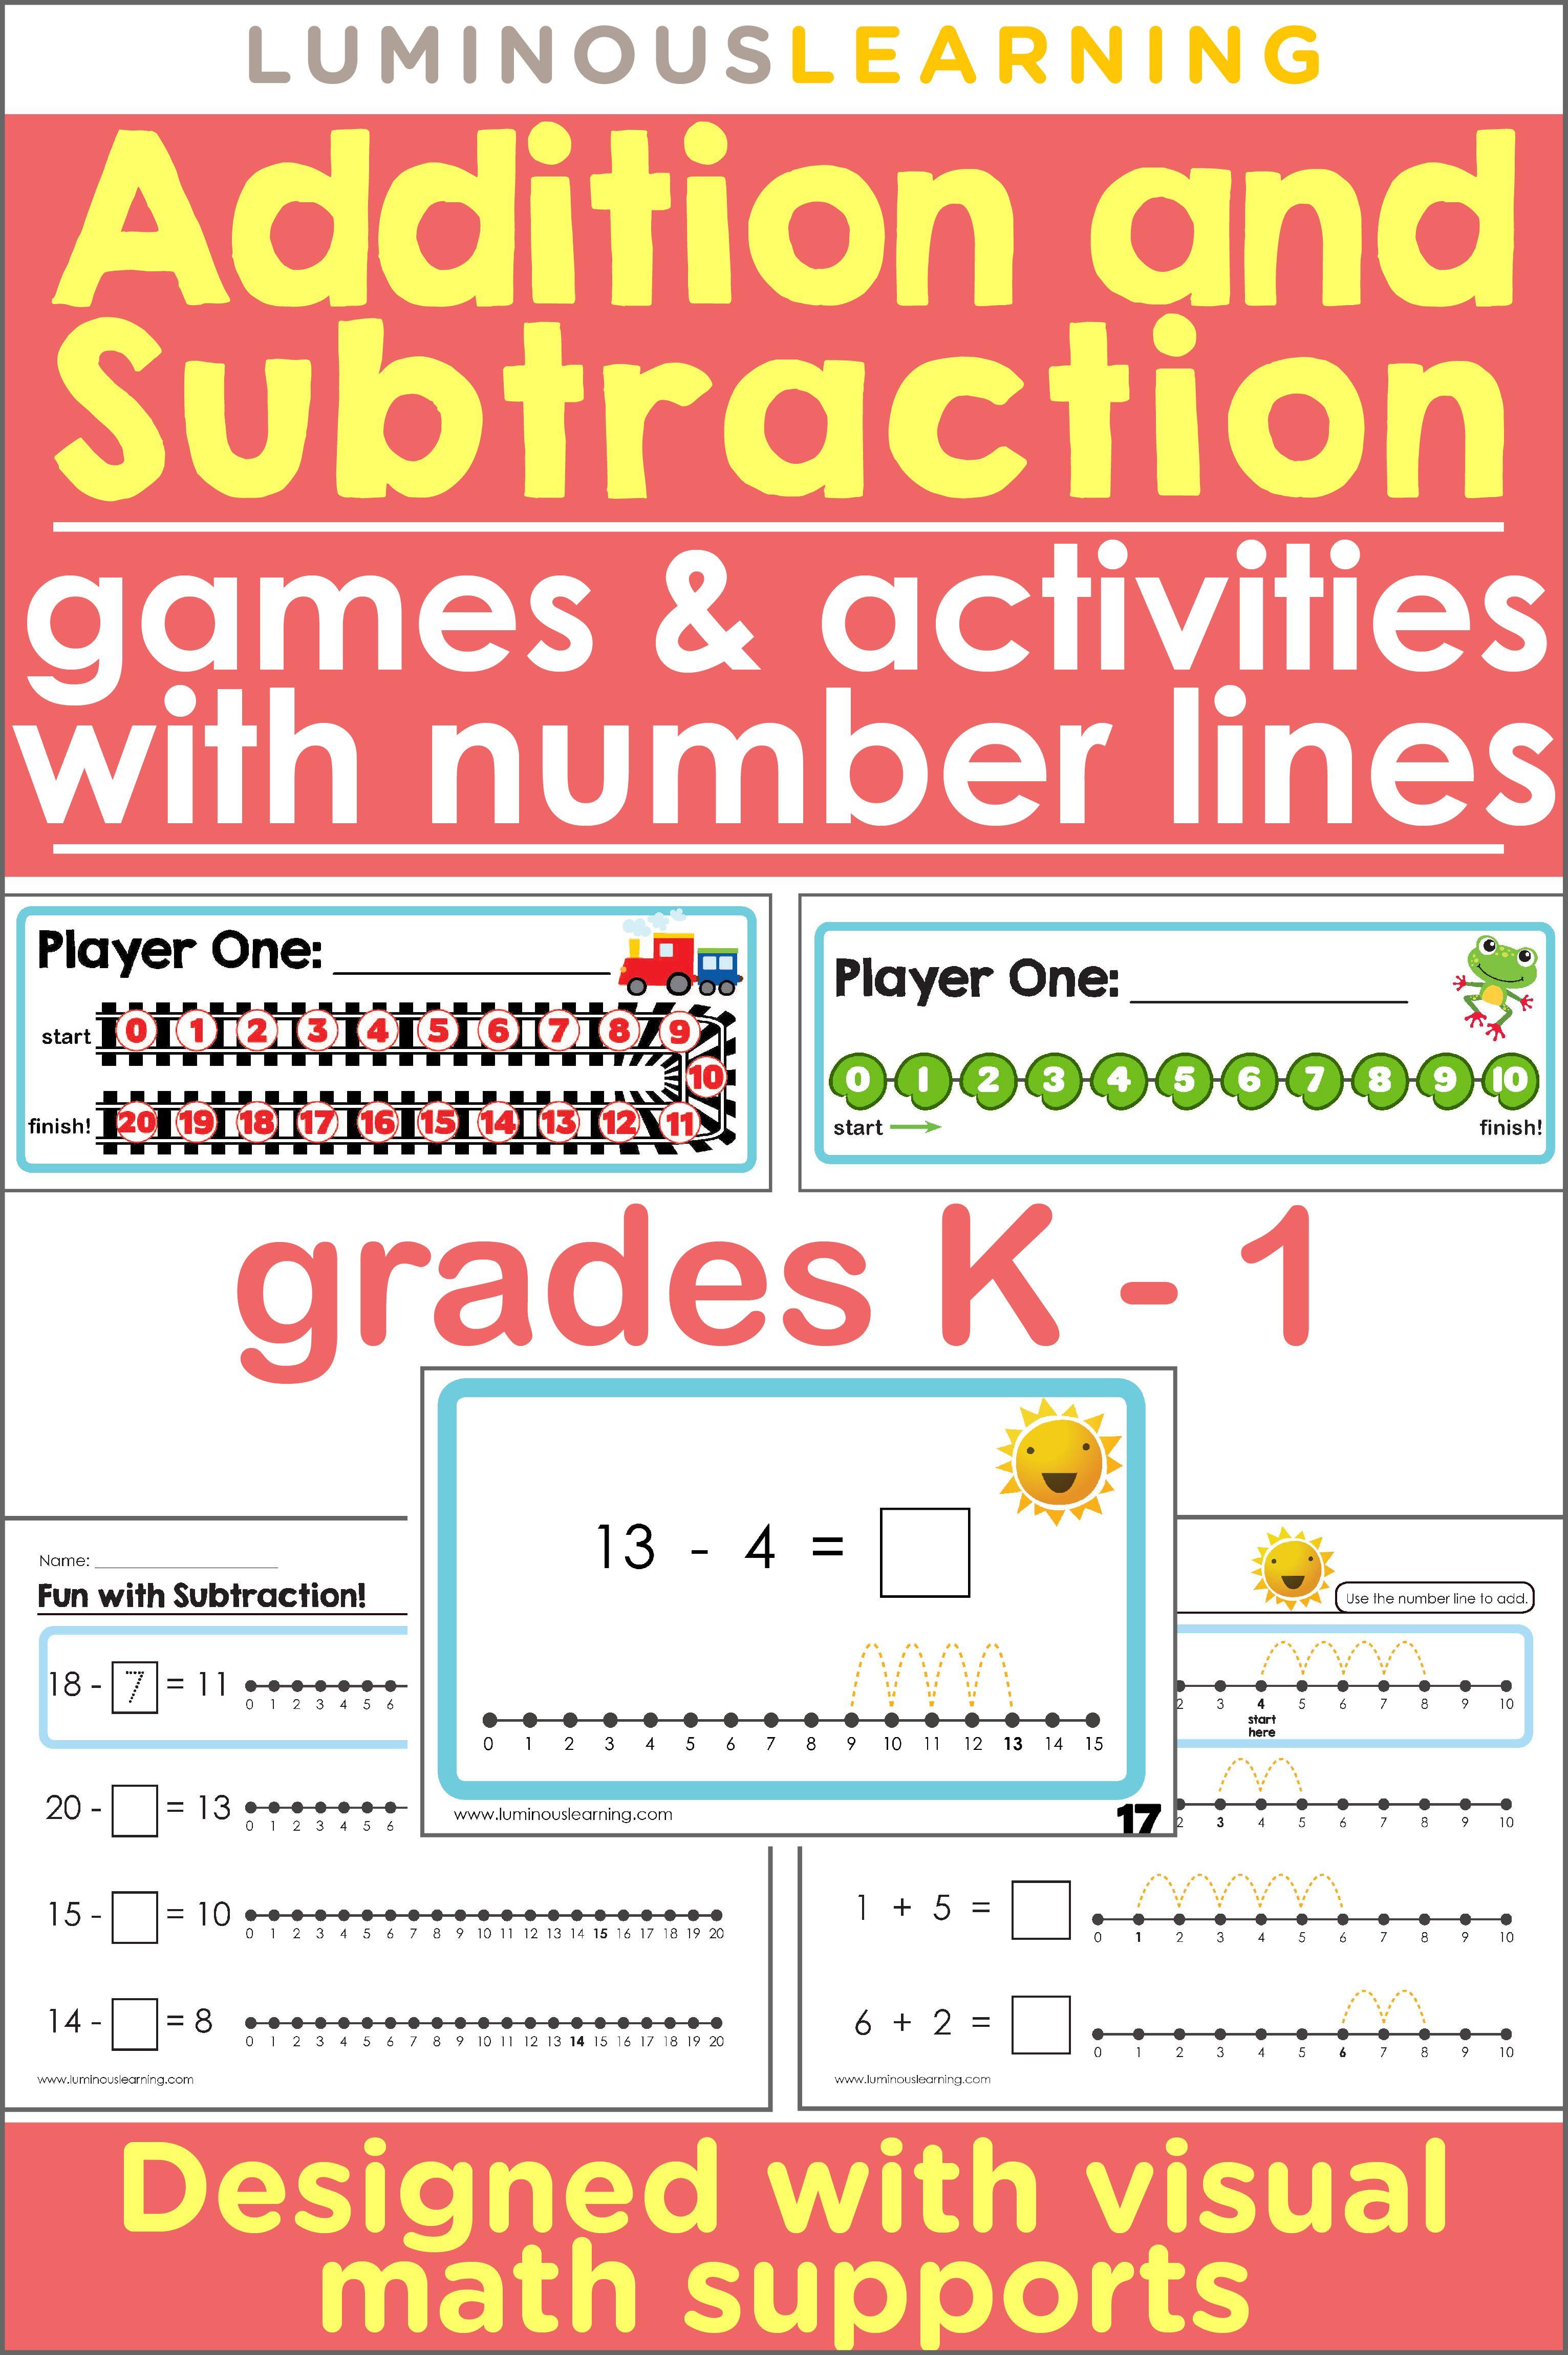 Pin By Luminous Learning On Luminous Learning Math